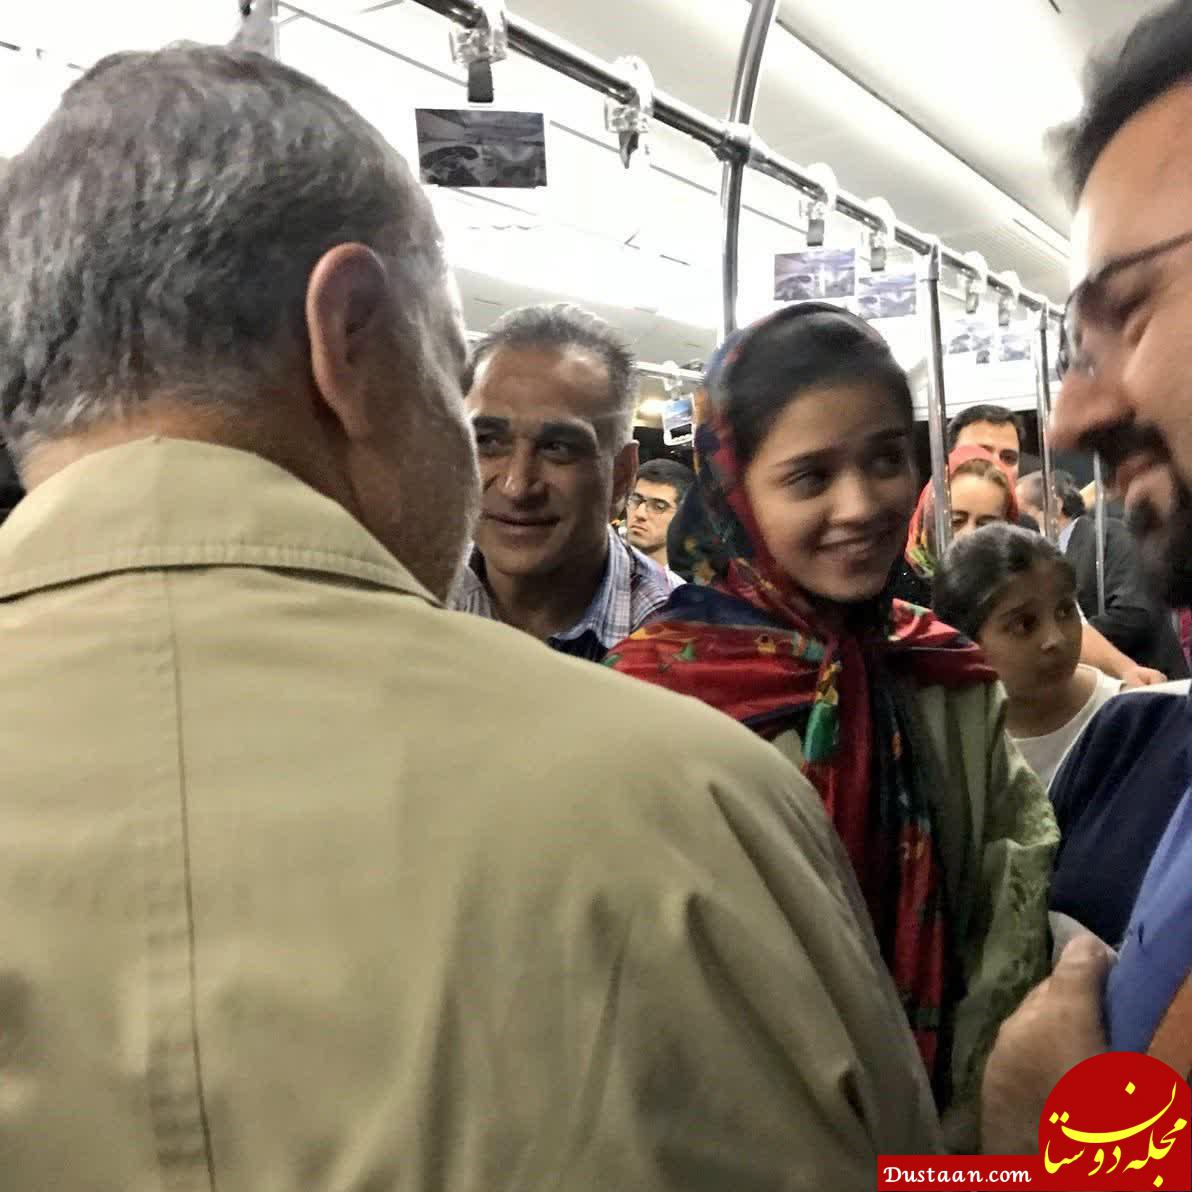 www.dustaan.com حضور سردارسلیمانی در اتوبوس عمومی فرودگاه +عکس